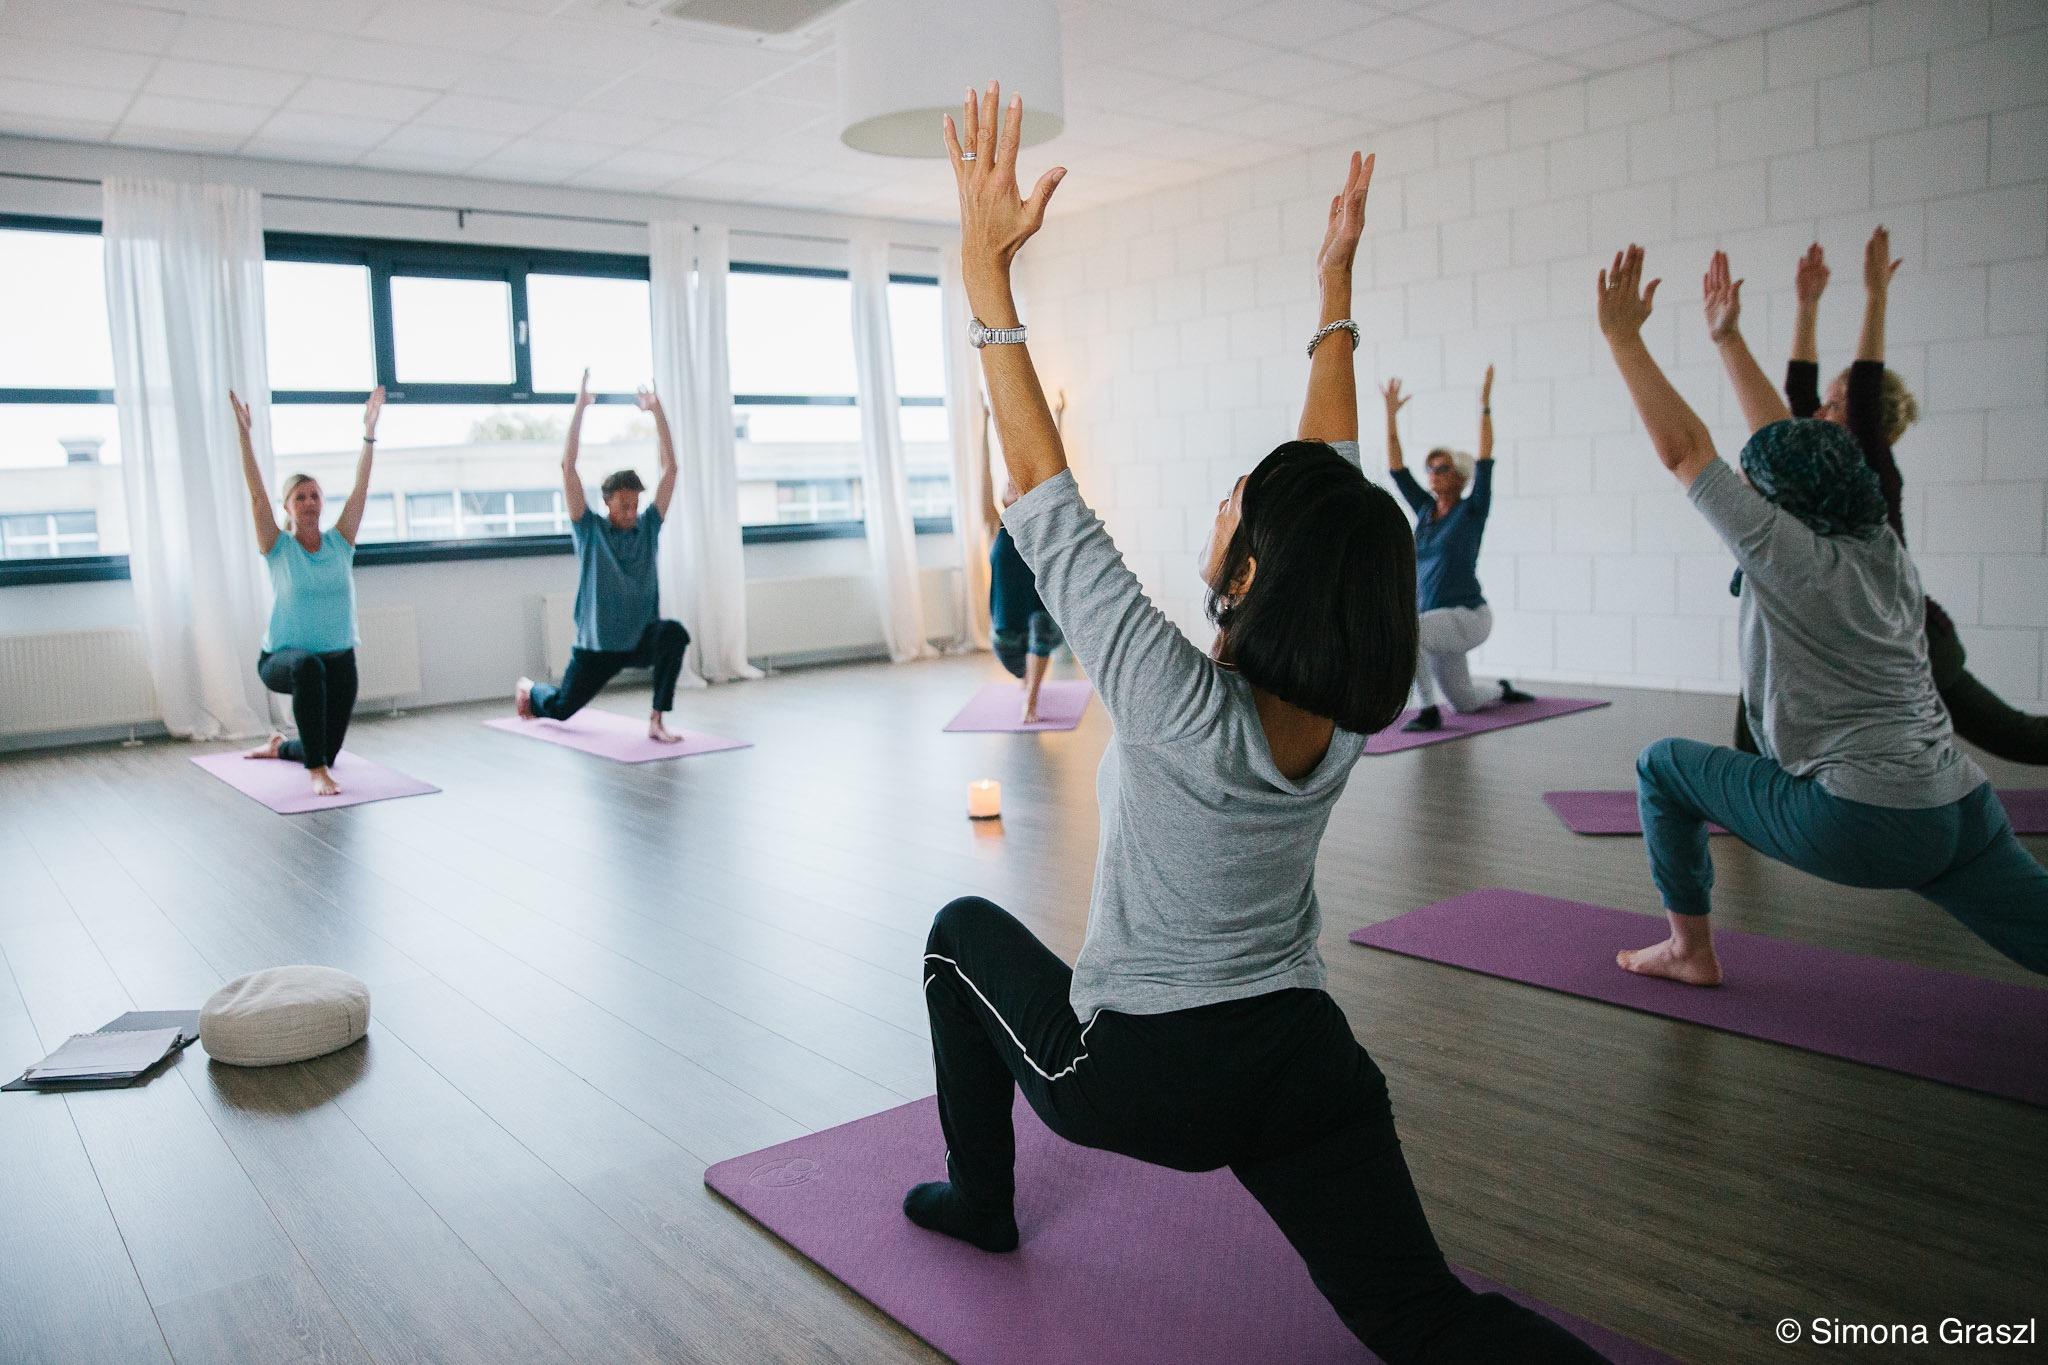 20171028_SimonaGraszl_Yoga Centrum Voorhout_0077_2048px.jpg